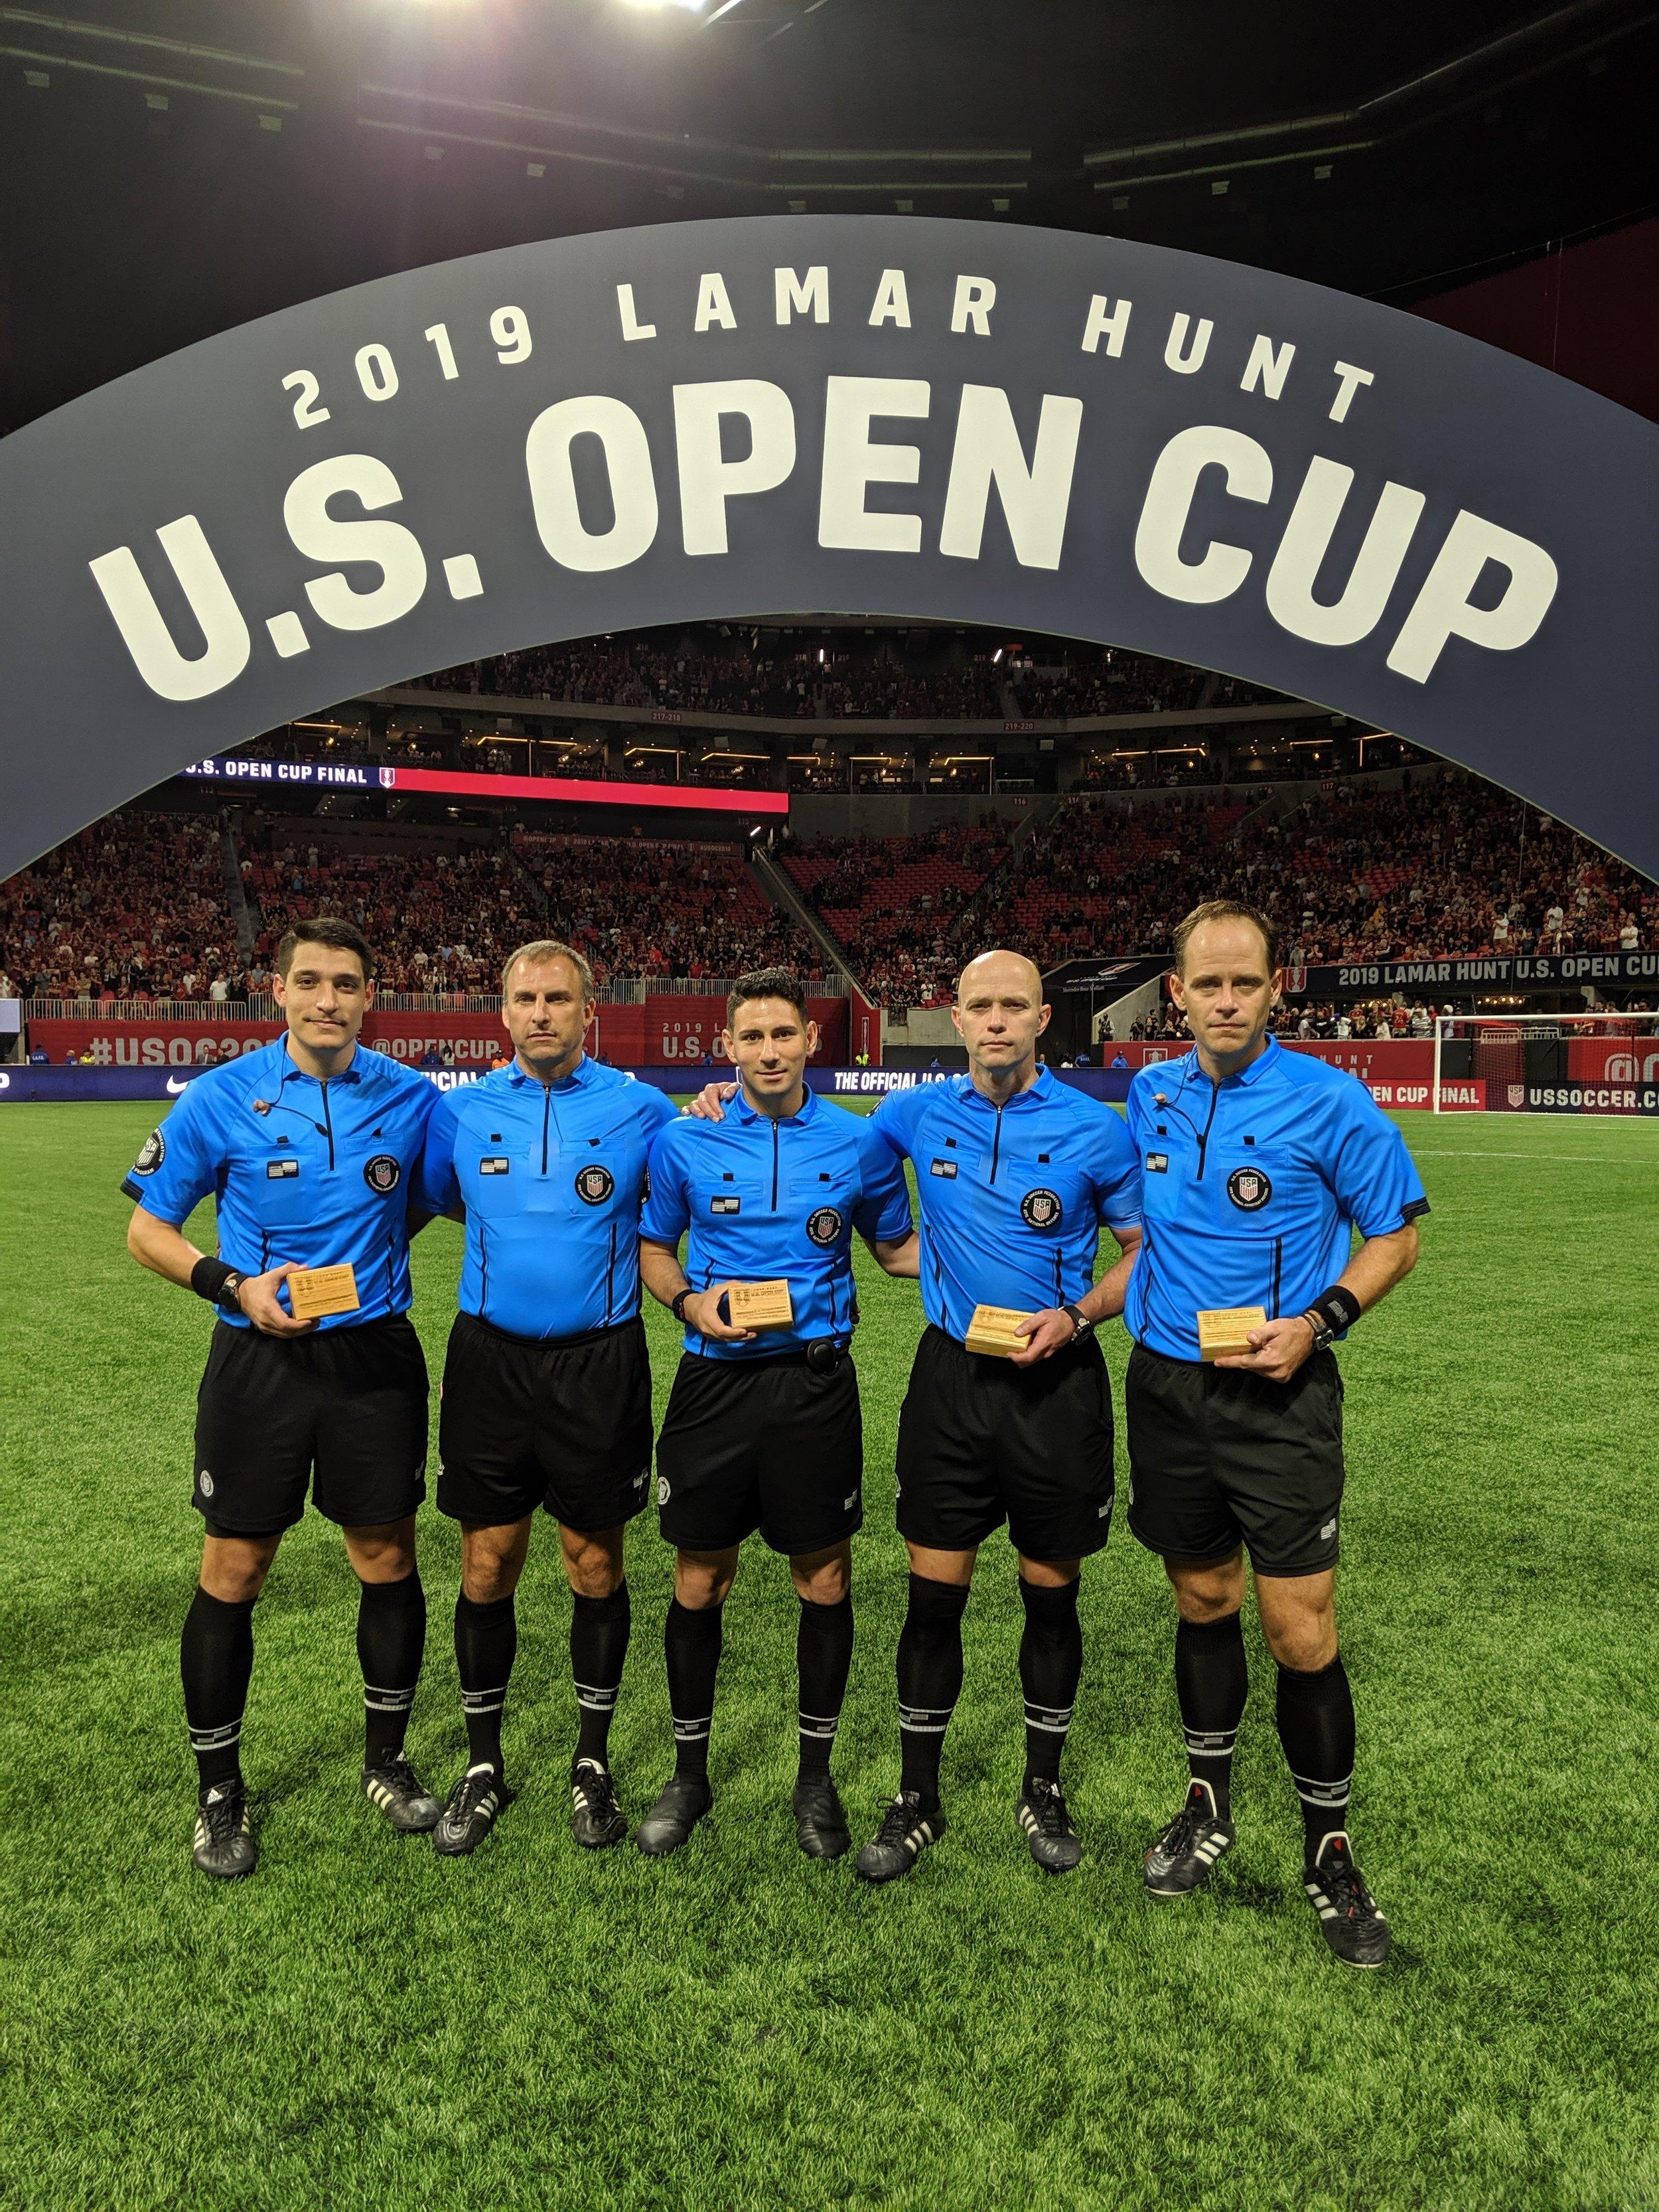 Open Cup Final.jpg